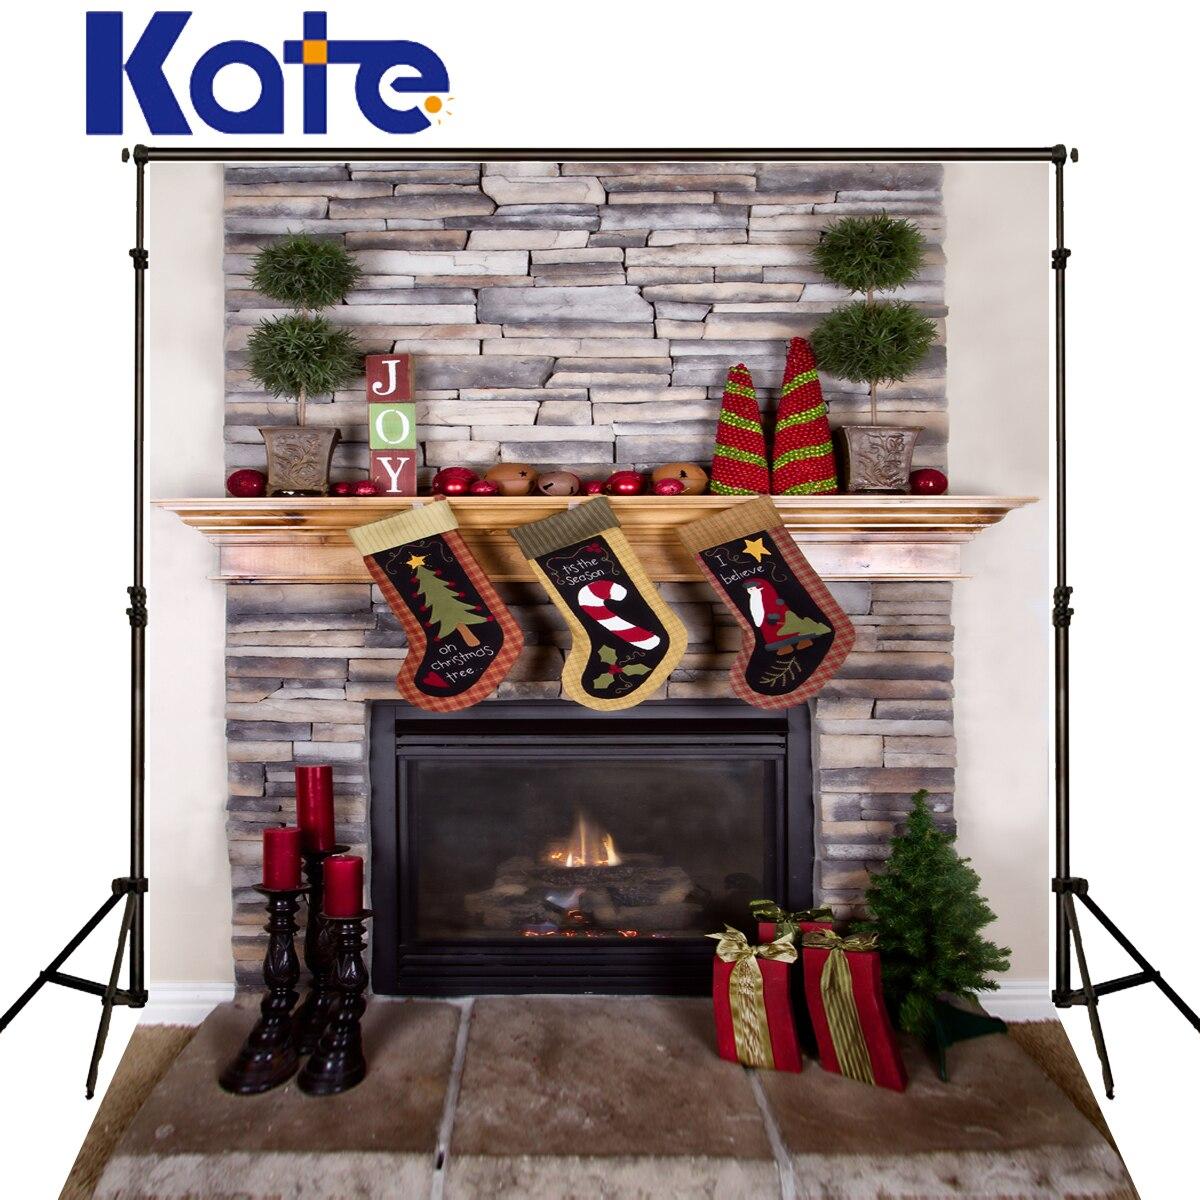 Kate Christmas Photography Background Sock Fireplance Stove Backdrop  Candle Brick Wall Backgrounds For Photo Shoot сумка kate spade new york wkru2816 kate spade hanna